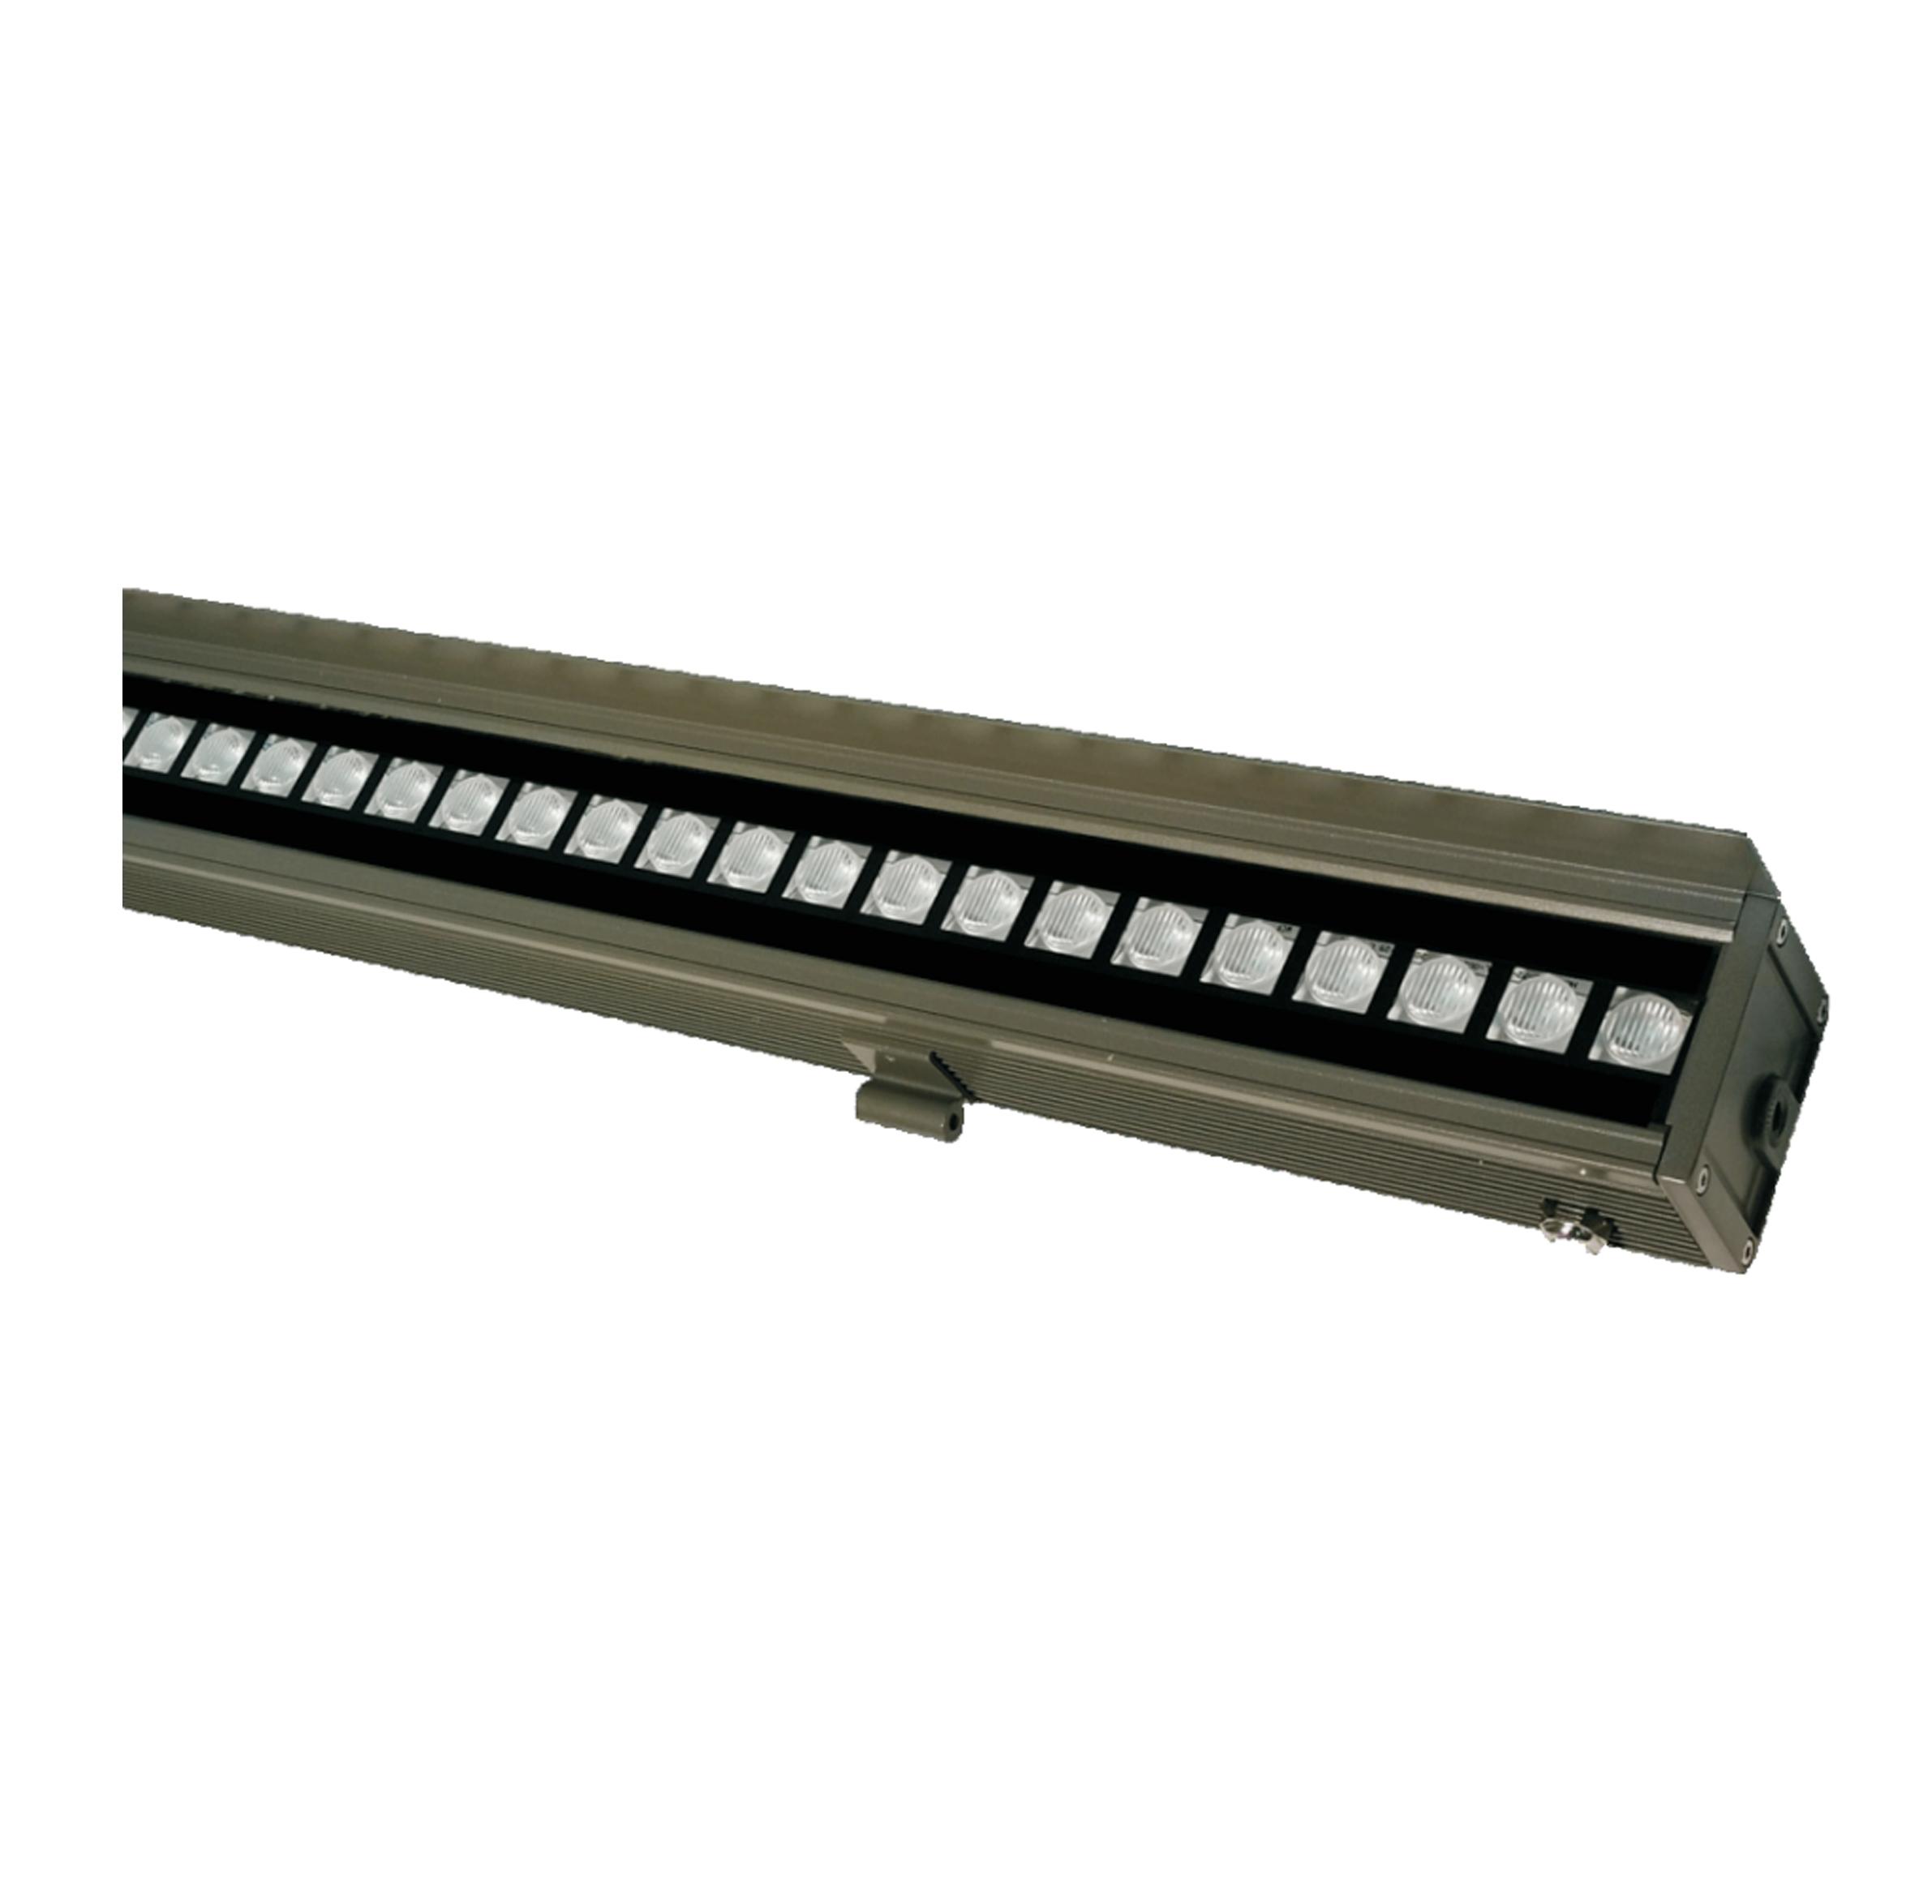 72W 90W 108W LED OUTDOOR FACADE  WALLWASHER SPOT LIGHT IP66 DMX512 RGB TUNABLE